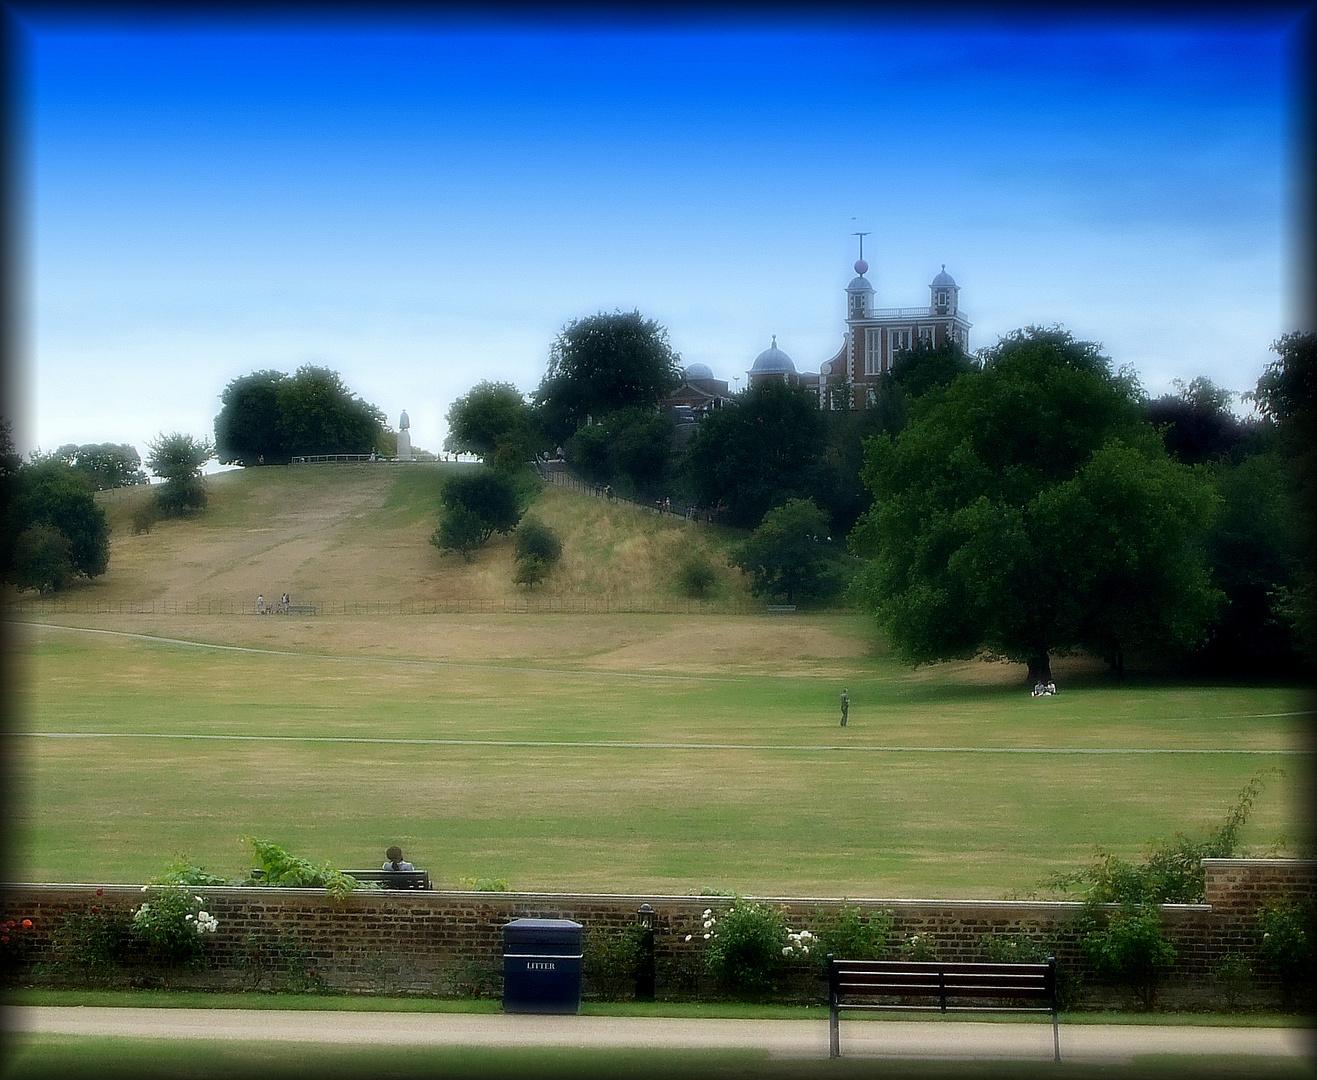 Taller - Observatorio de Greenwich